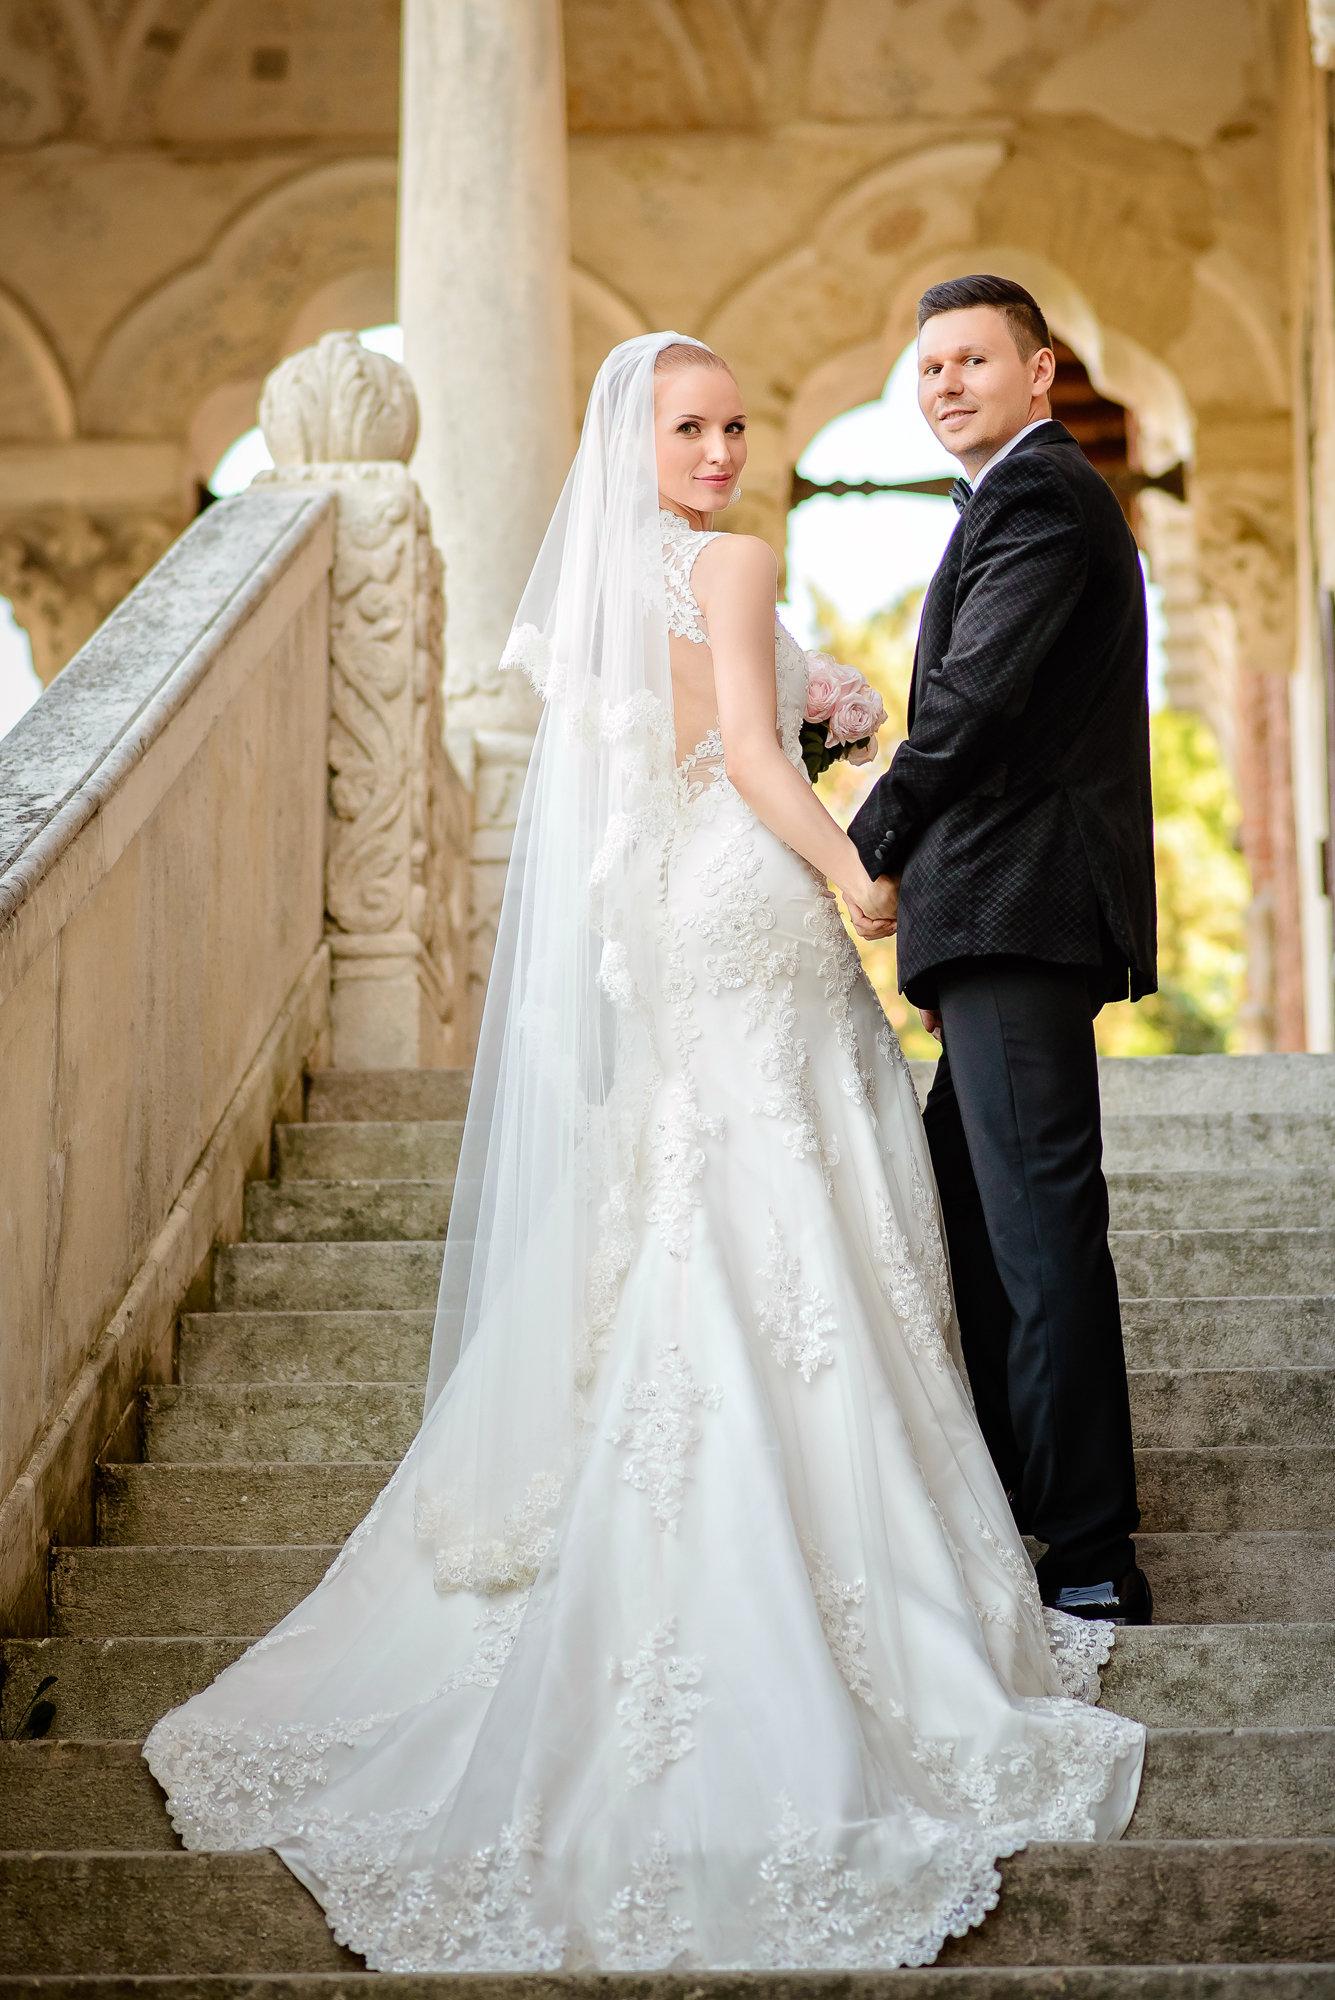 alexandru madalina wedding day 33